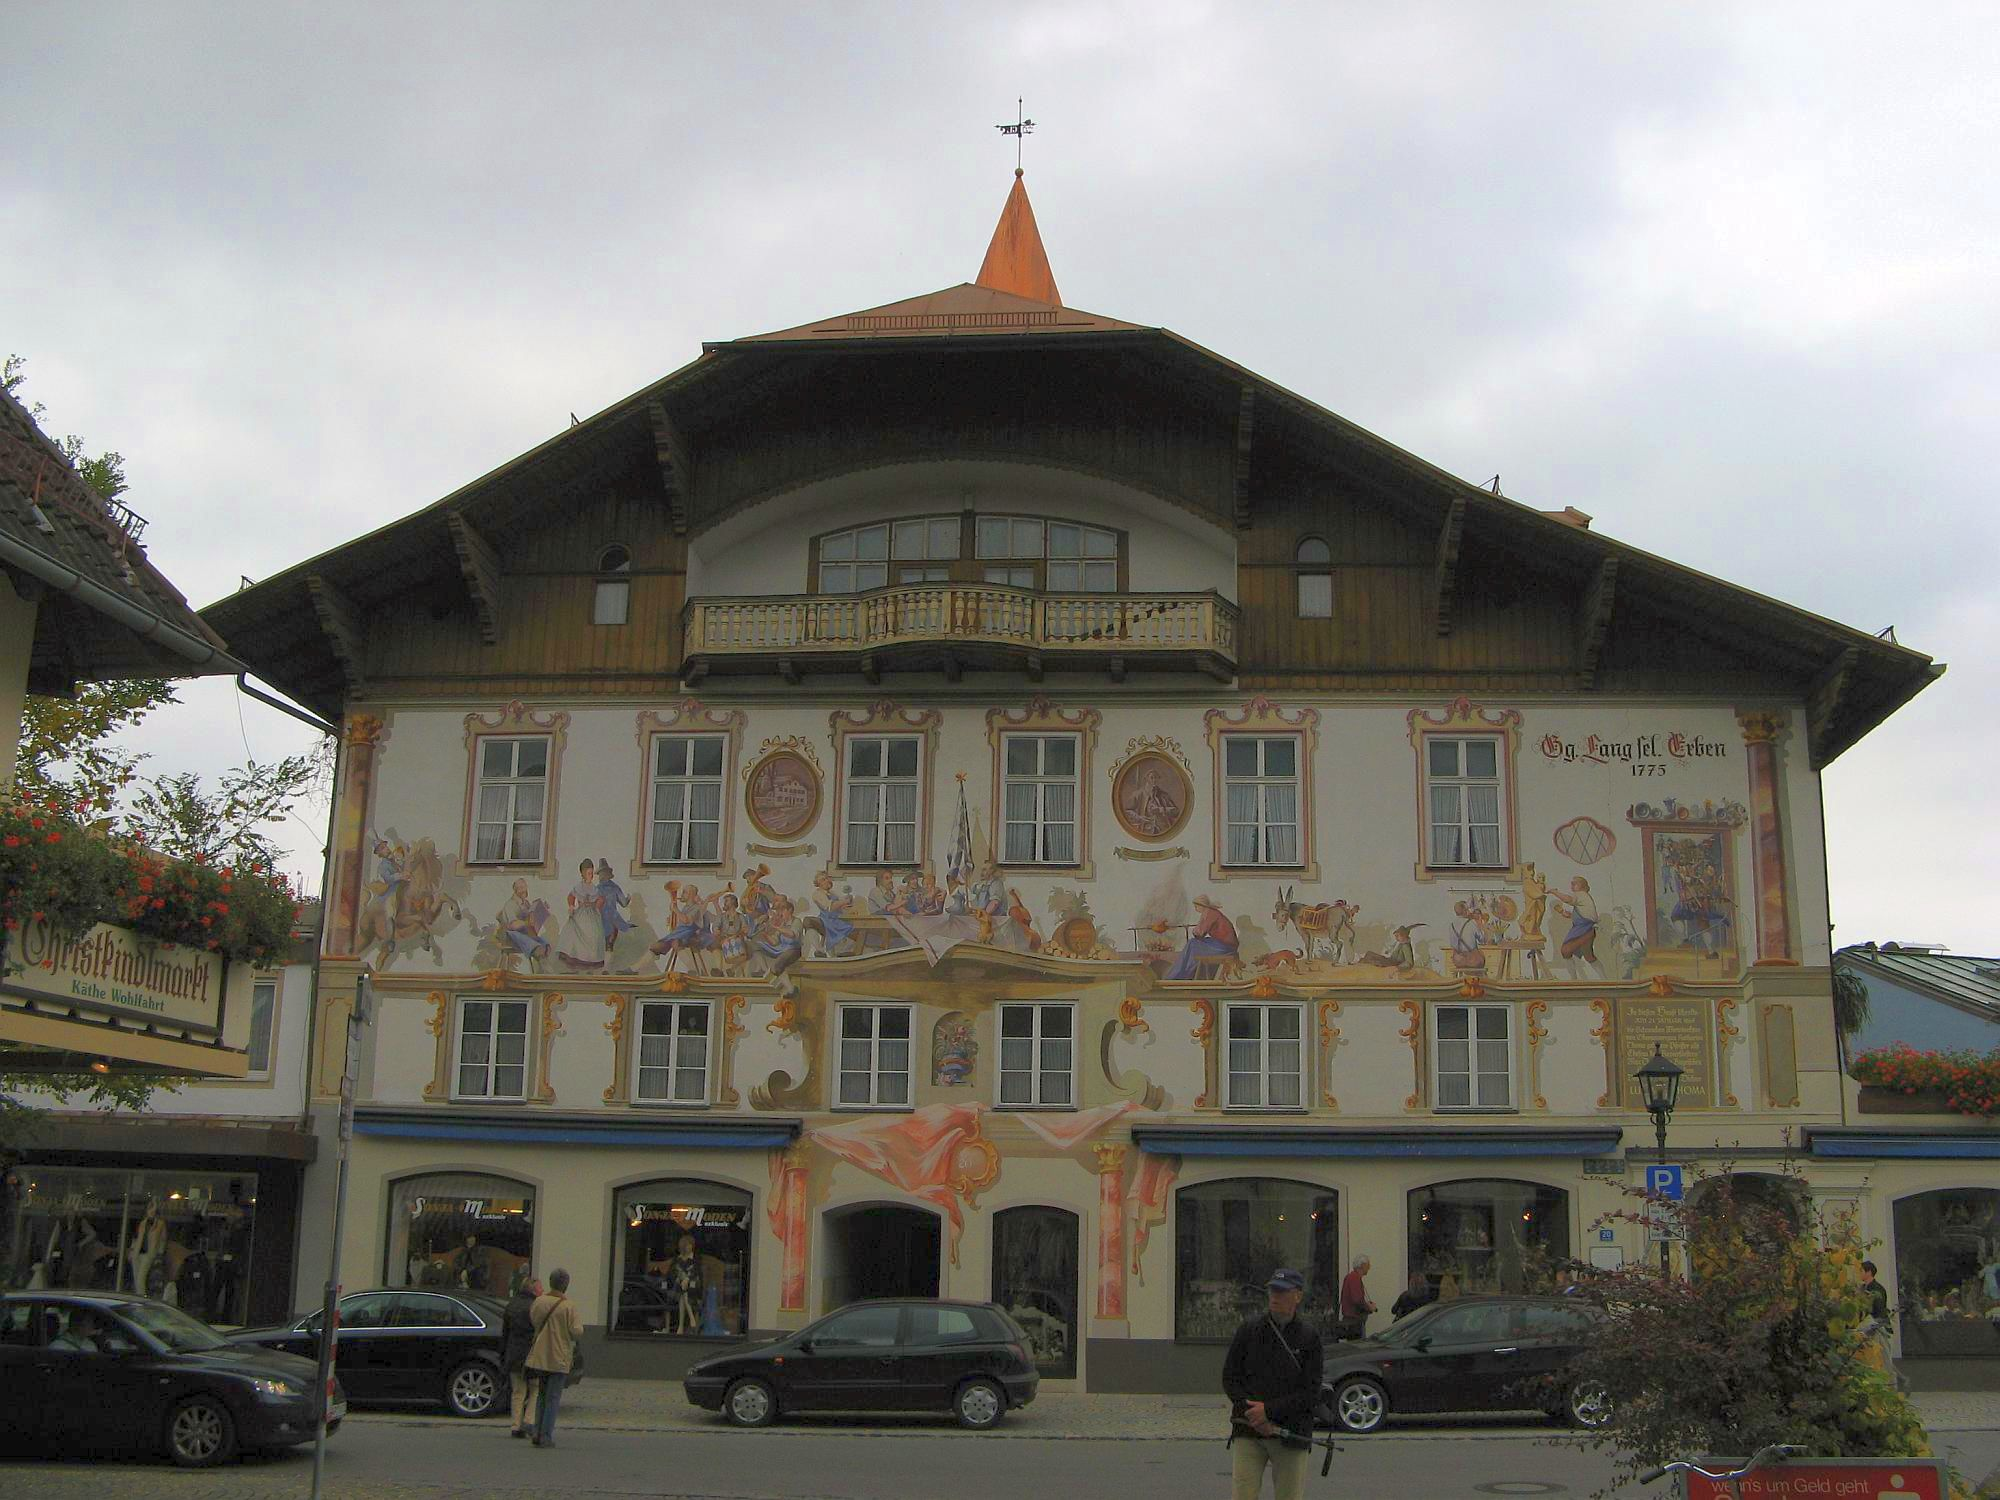 Datei:Oberammergau - Geburtshaus Ludwig Thoma.jpg – Wikipedia